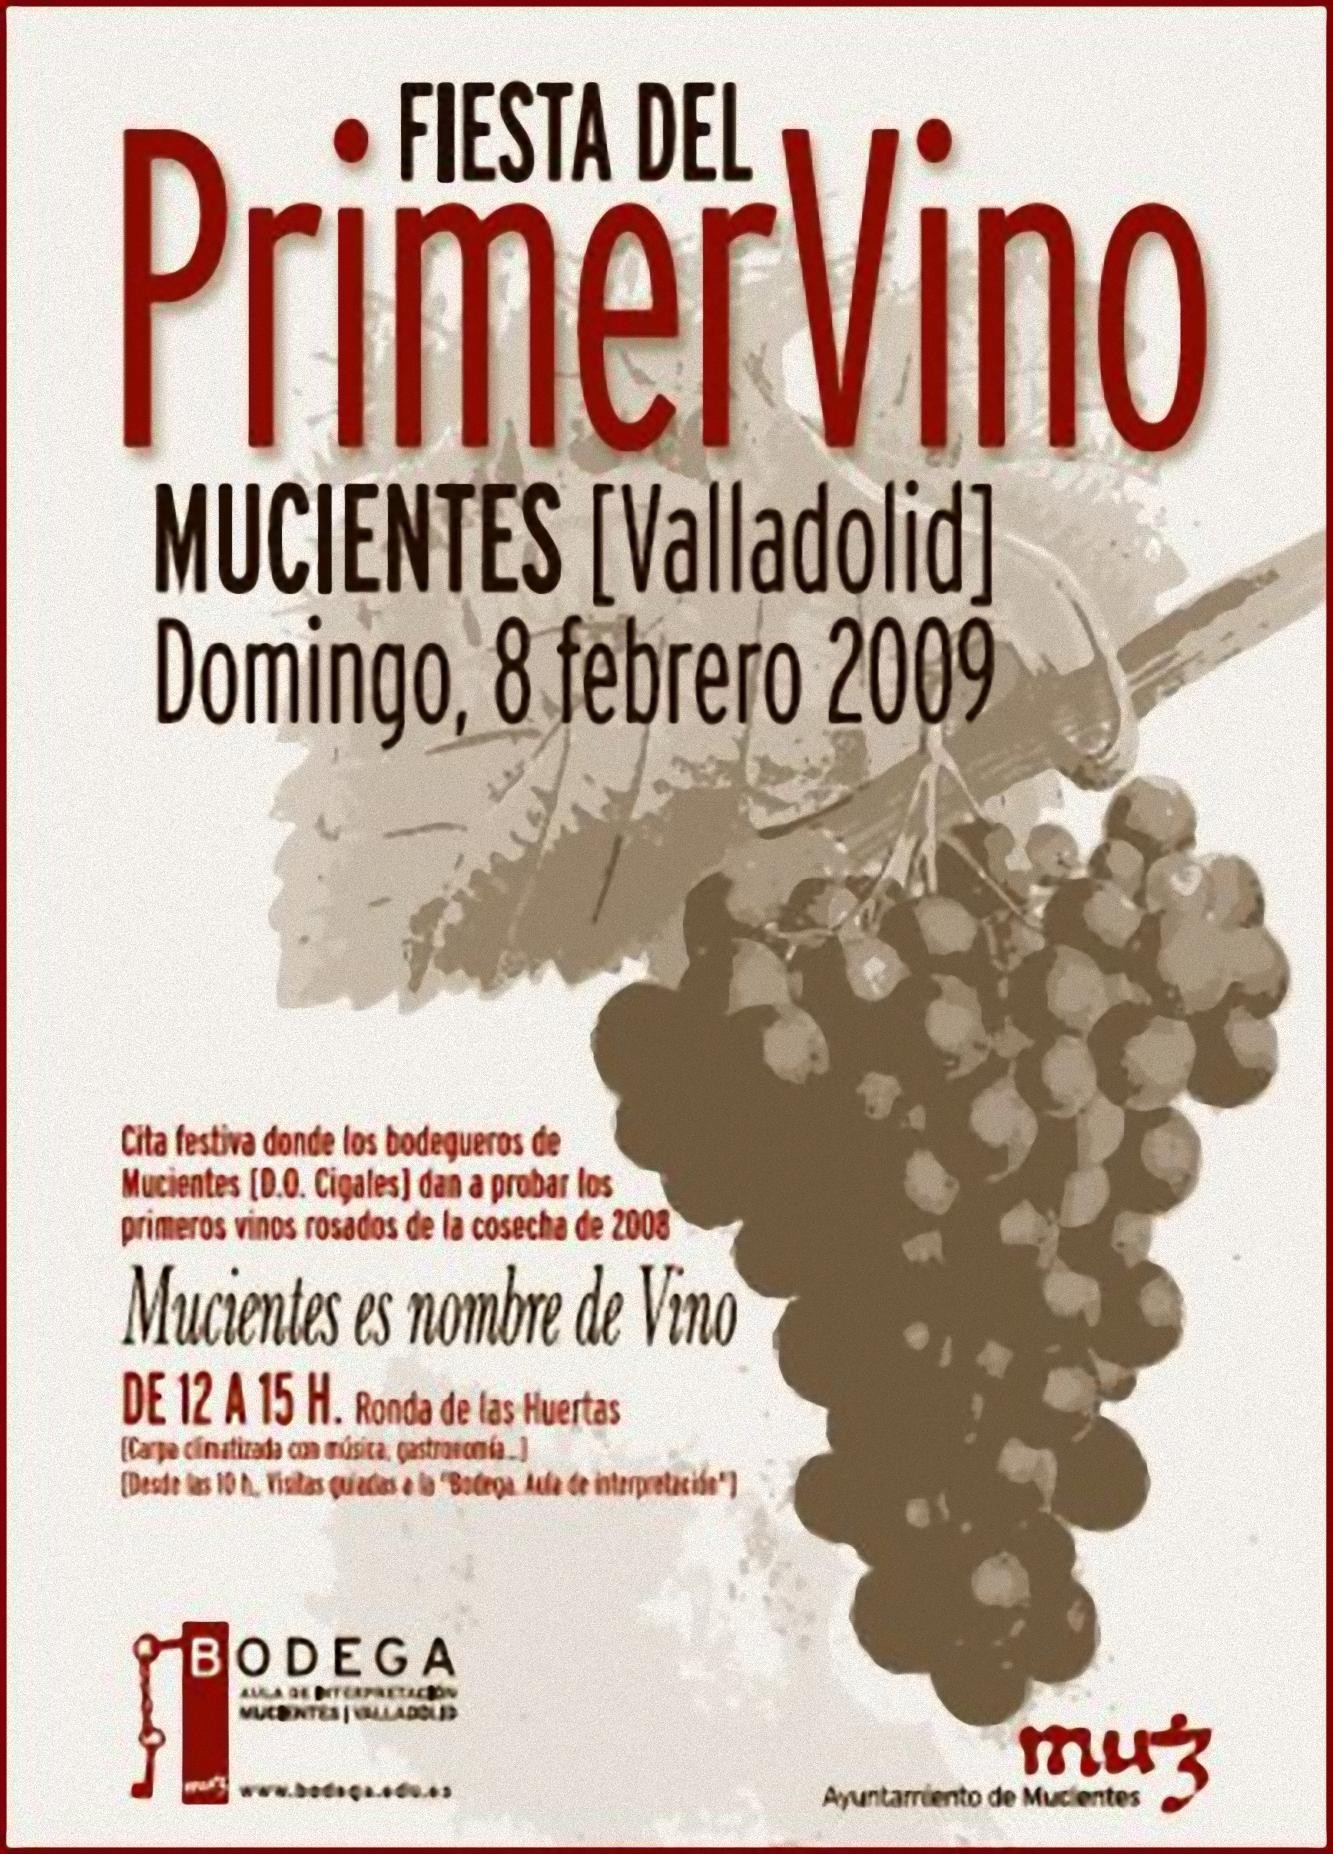 Fiesta del primer vino cosecha 2008 Mucientes